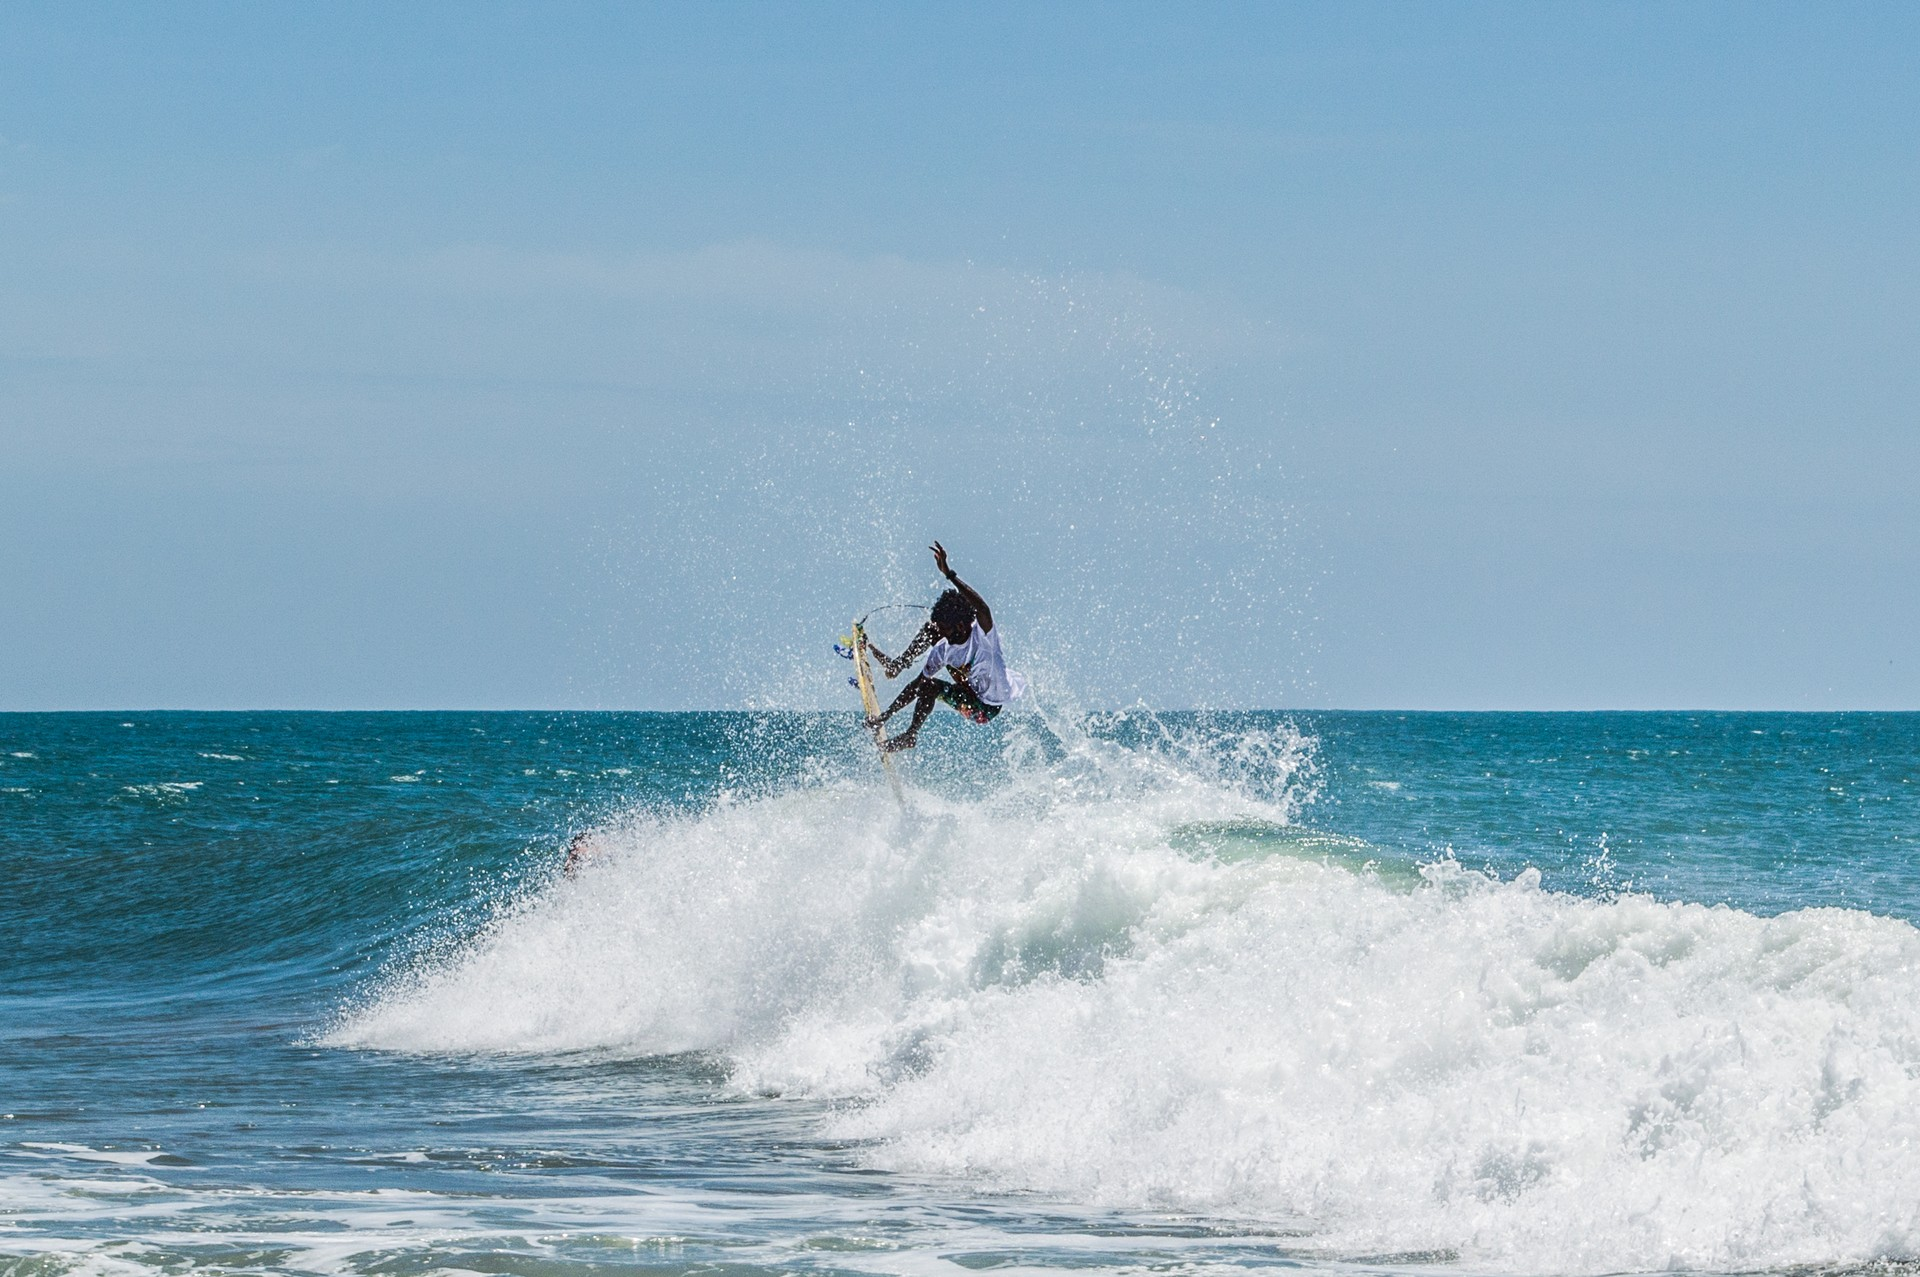 A surfer in Arugam Bay, Sri Lanka